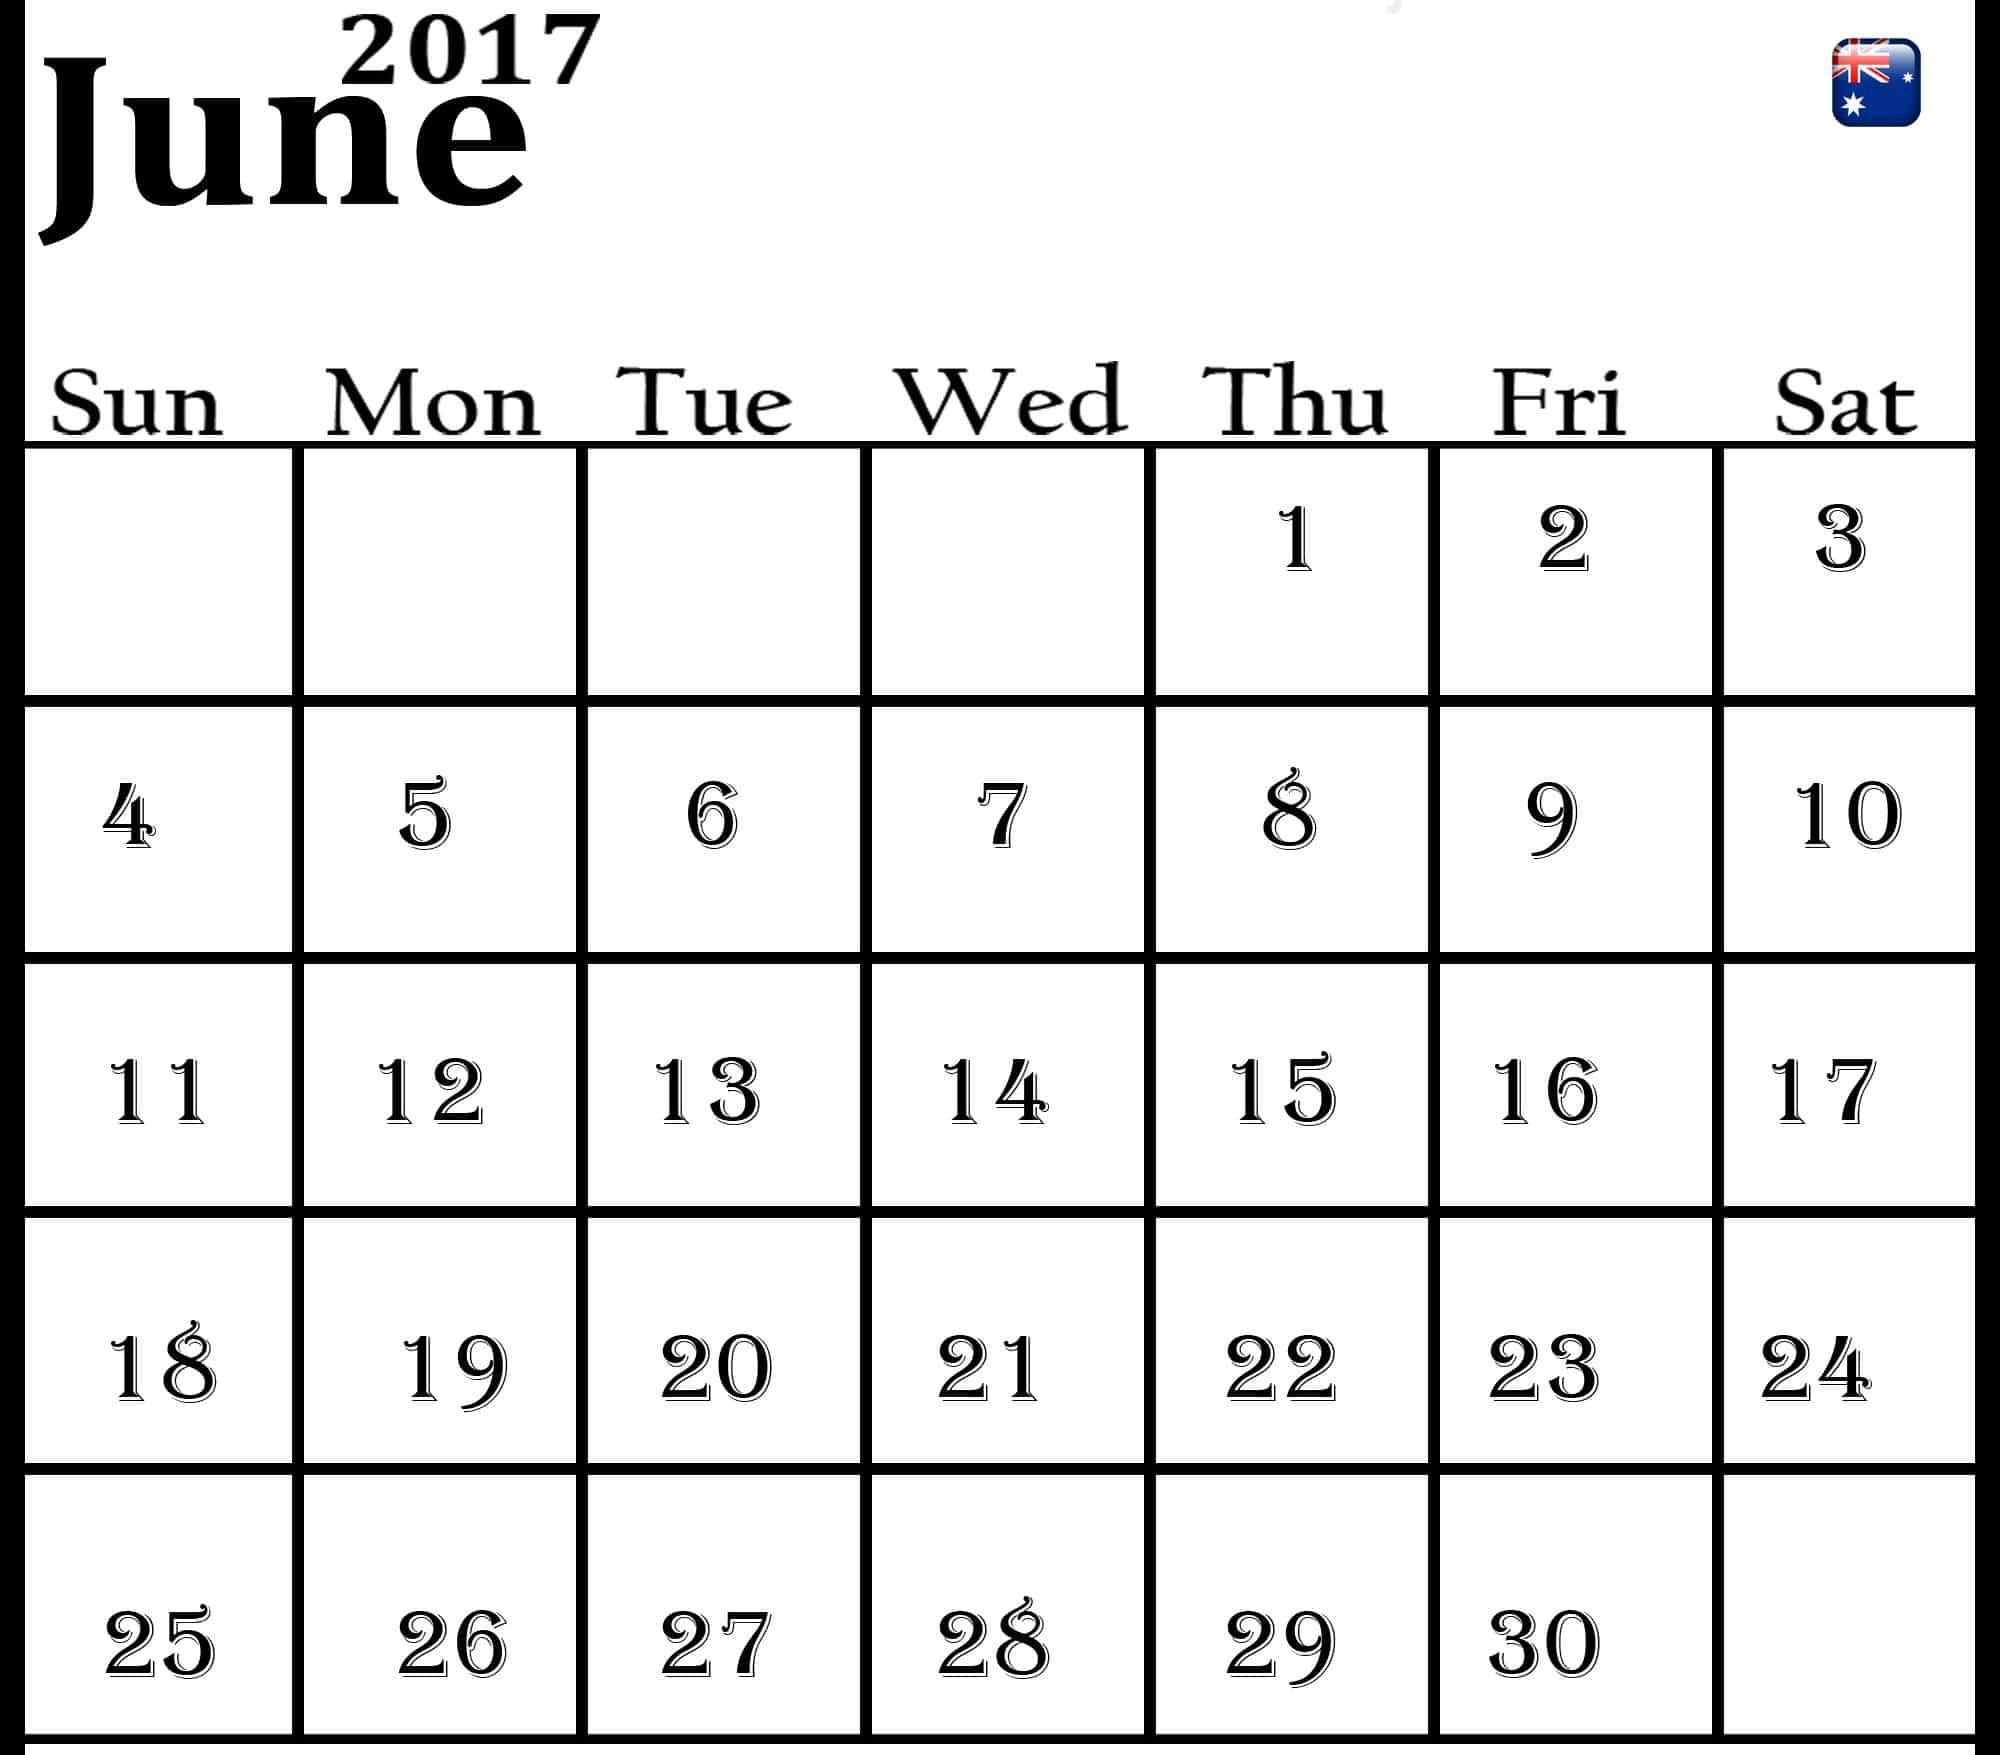 June 2017 calendar Pic Australia